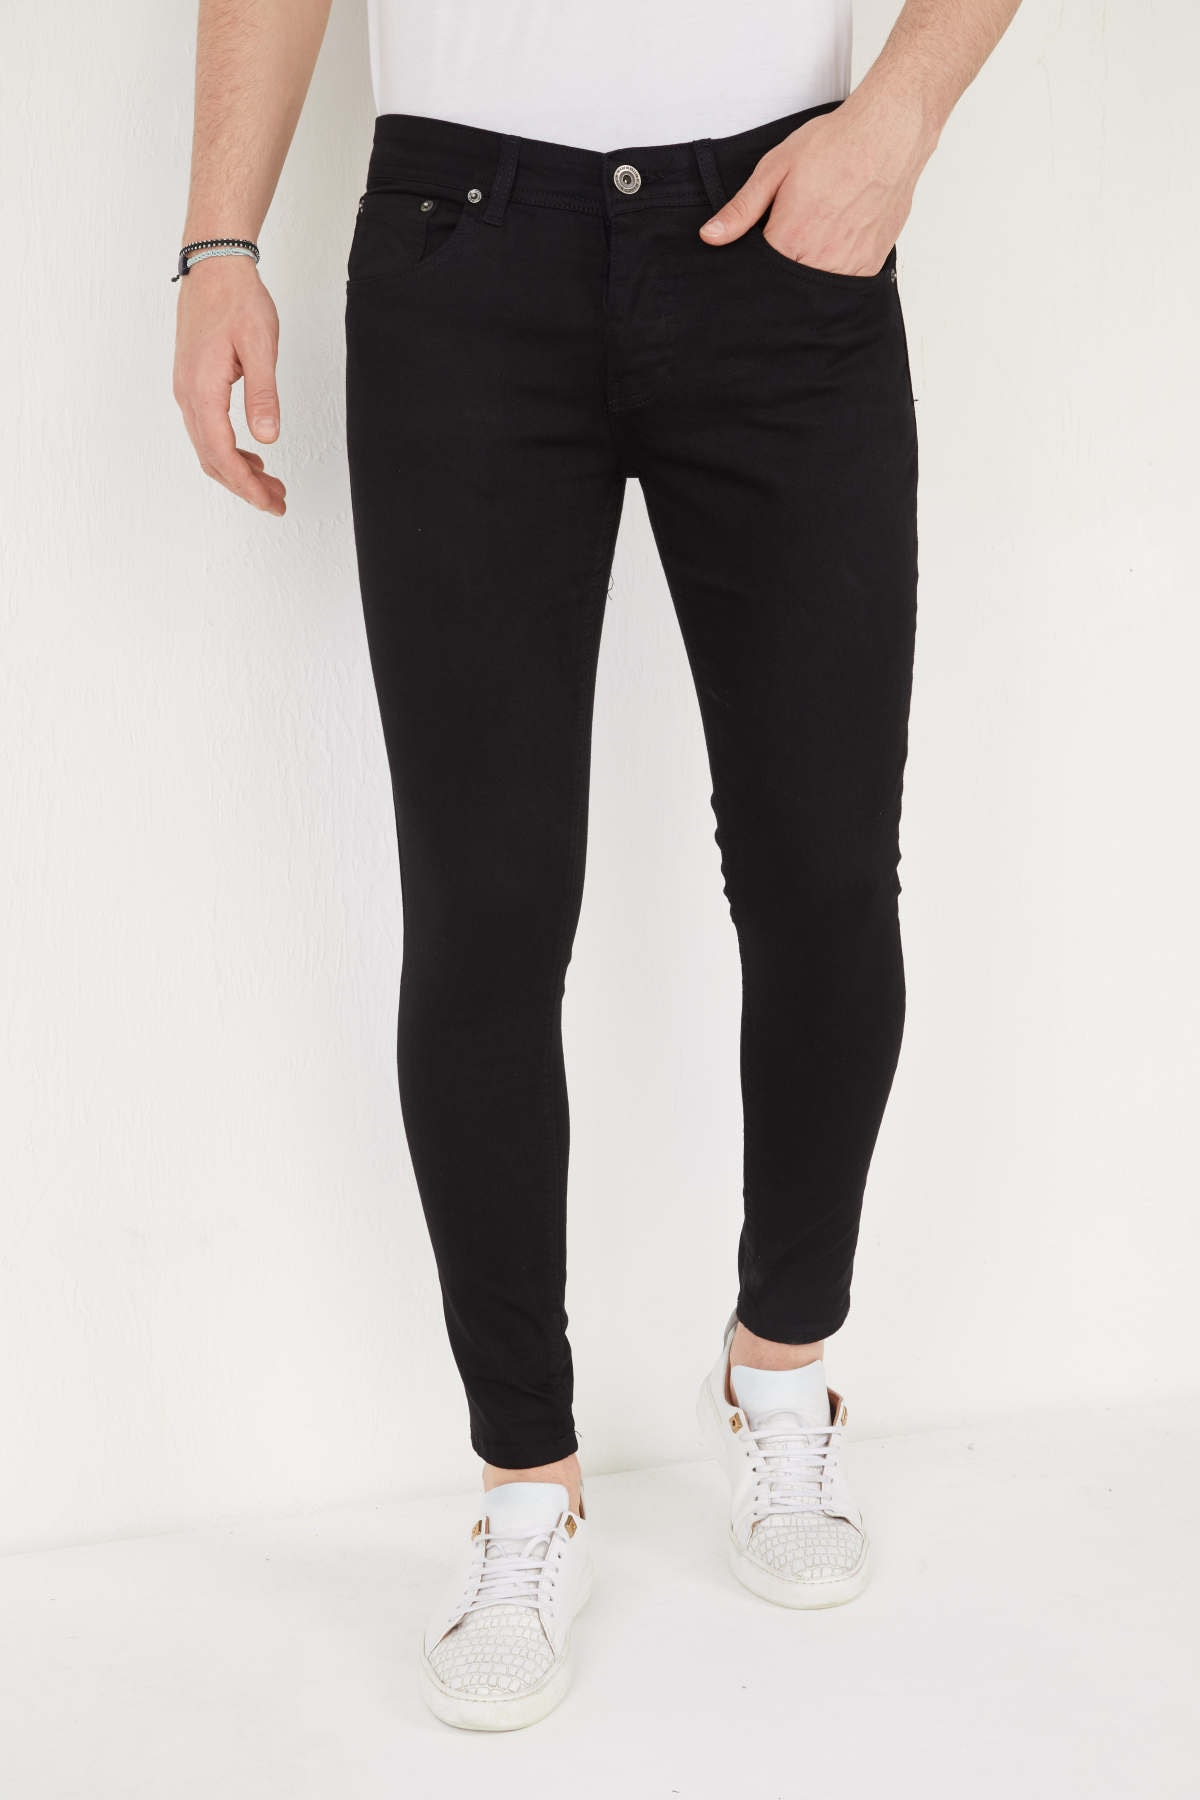 Erkek Siyah Skinny Fit Likralı Bilek Boy Pantolon